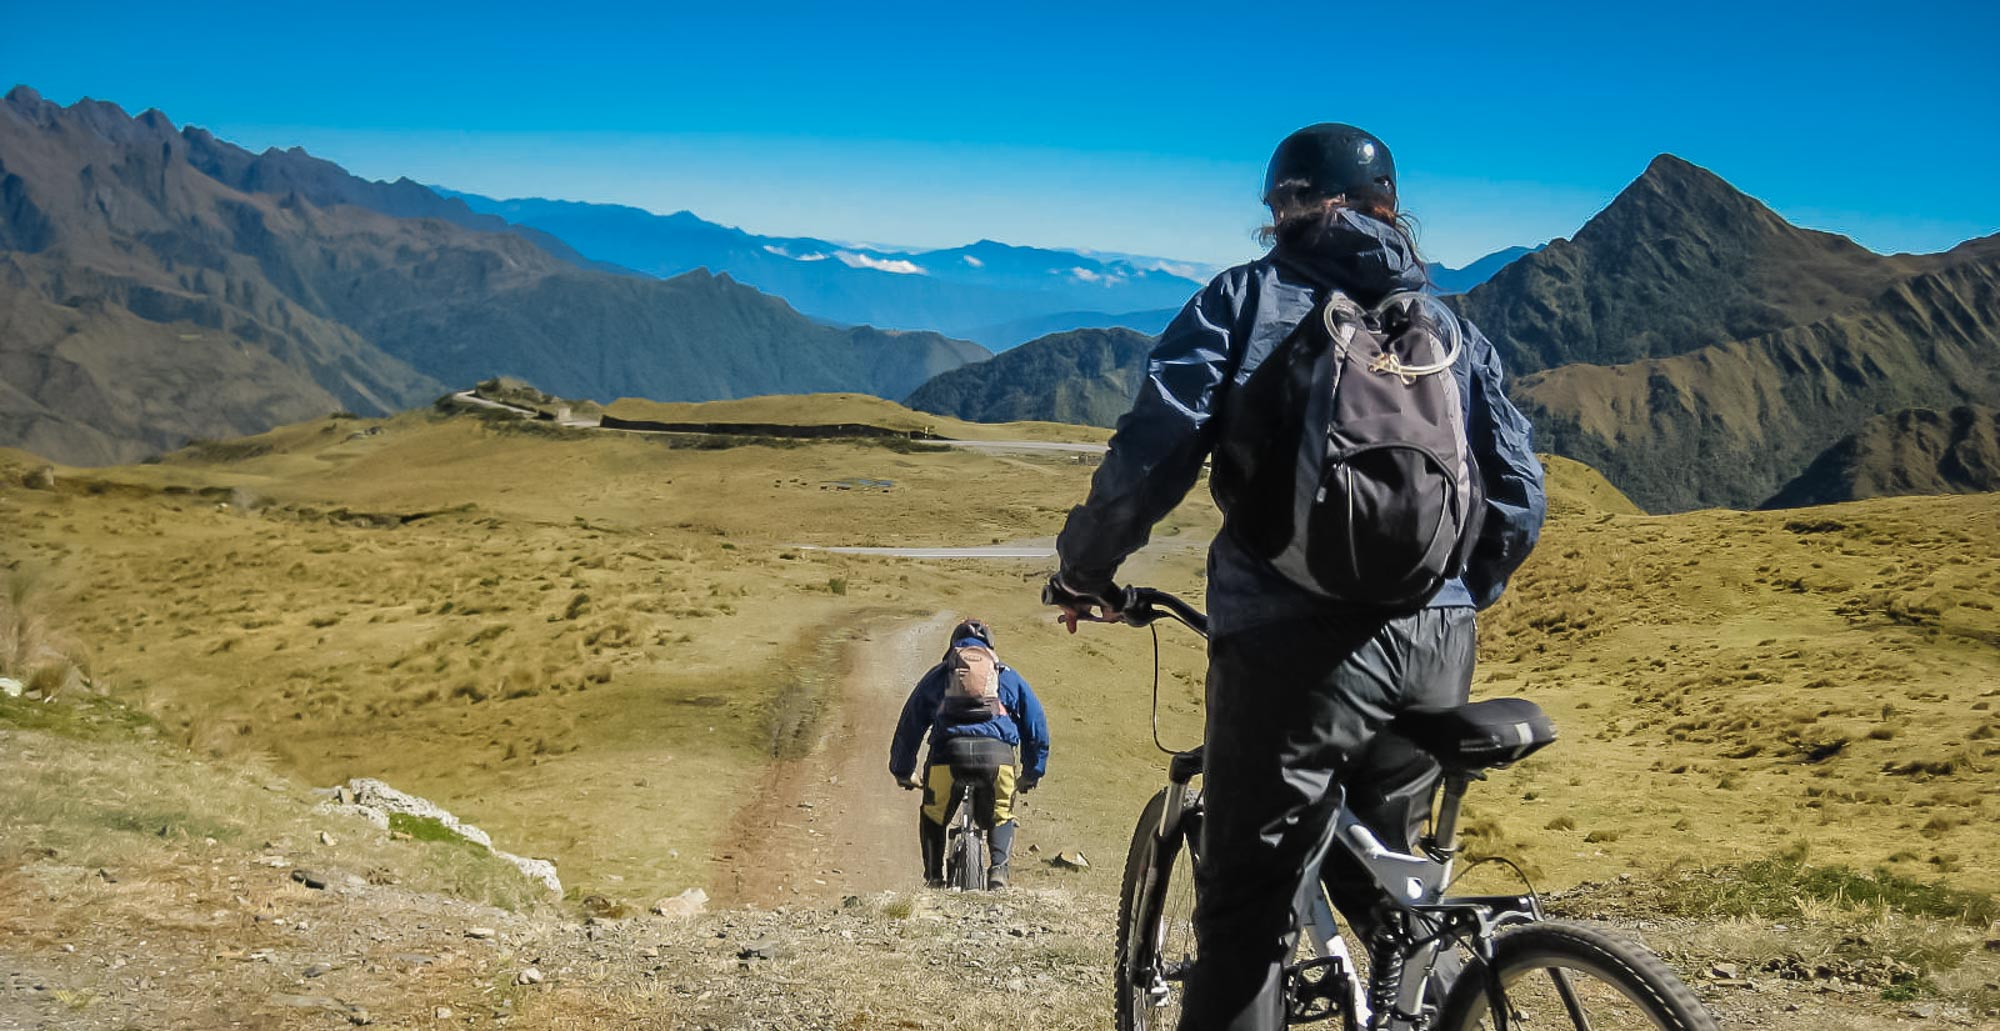 Concepción & Machu Picchu multi activity trip: Adventure in Peru